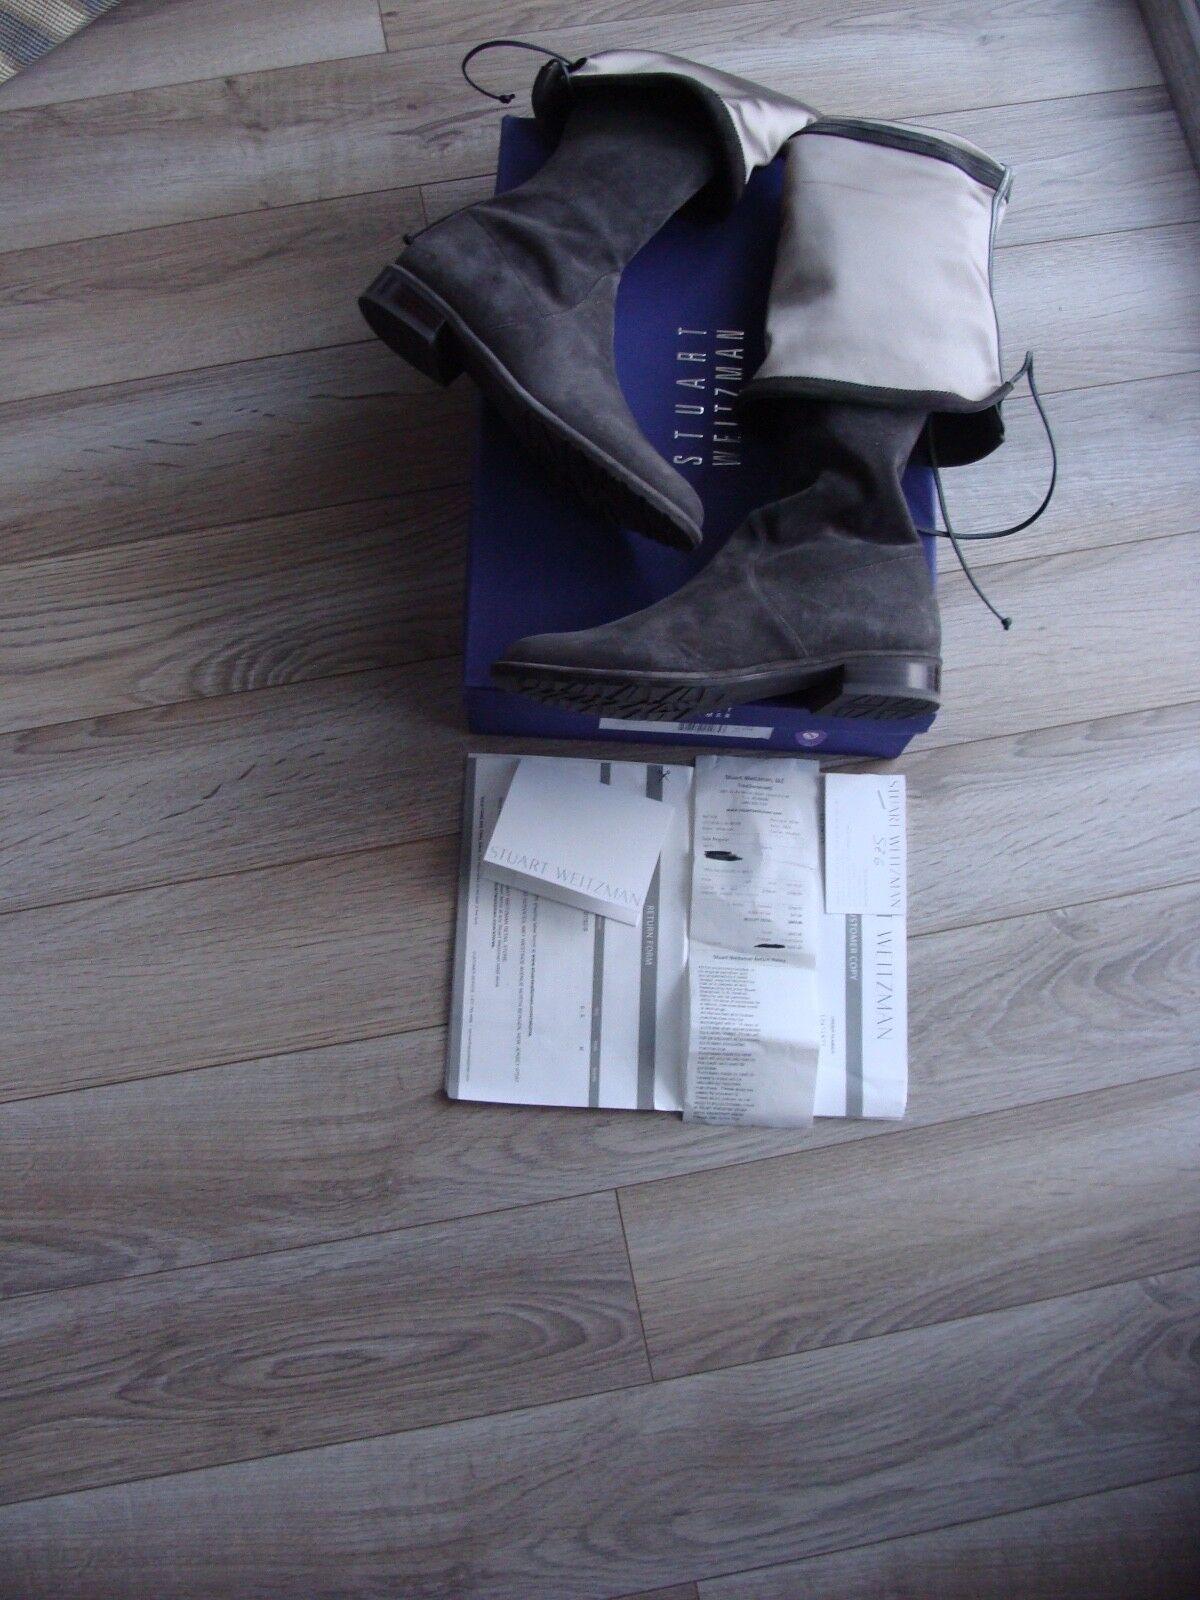 Stuart Weitzman Lowland Over the Knee Suede Boots Grey 37 Euro